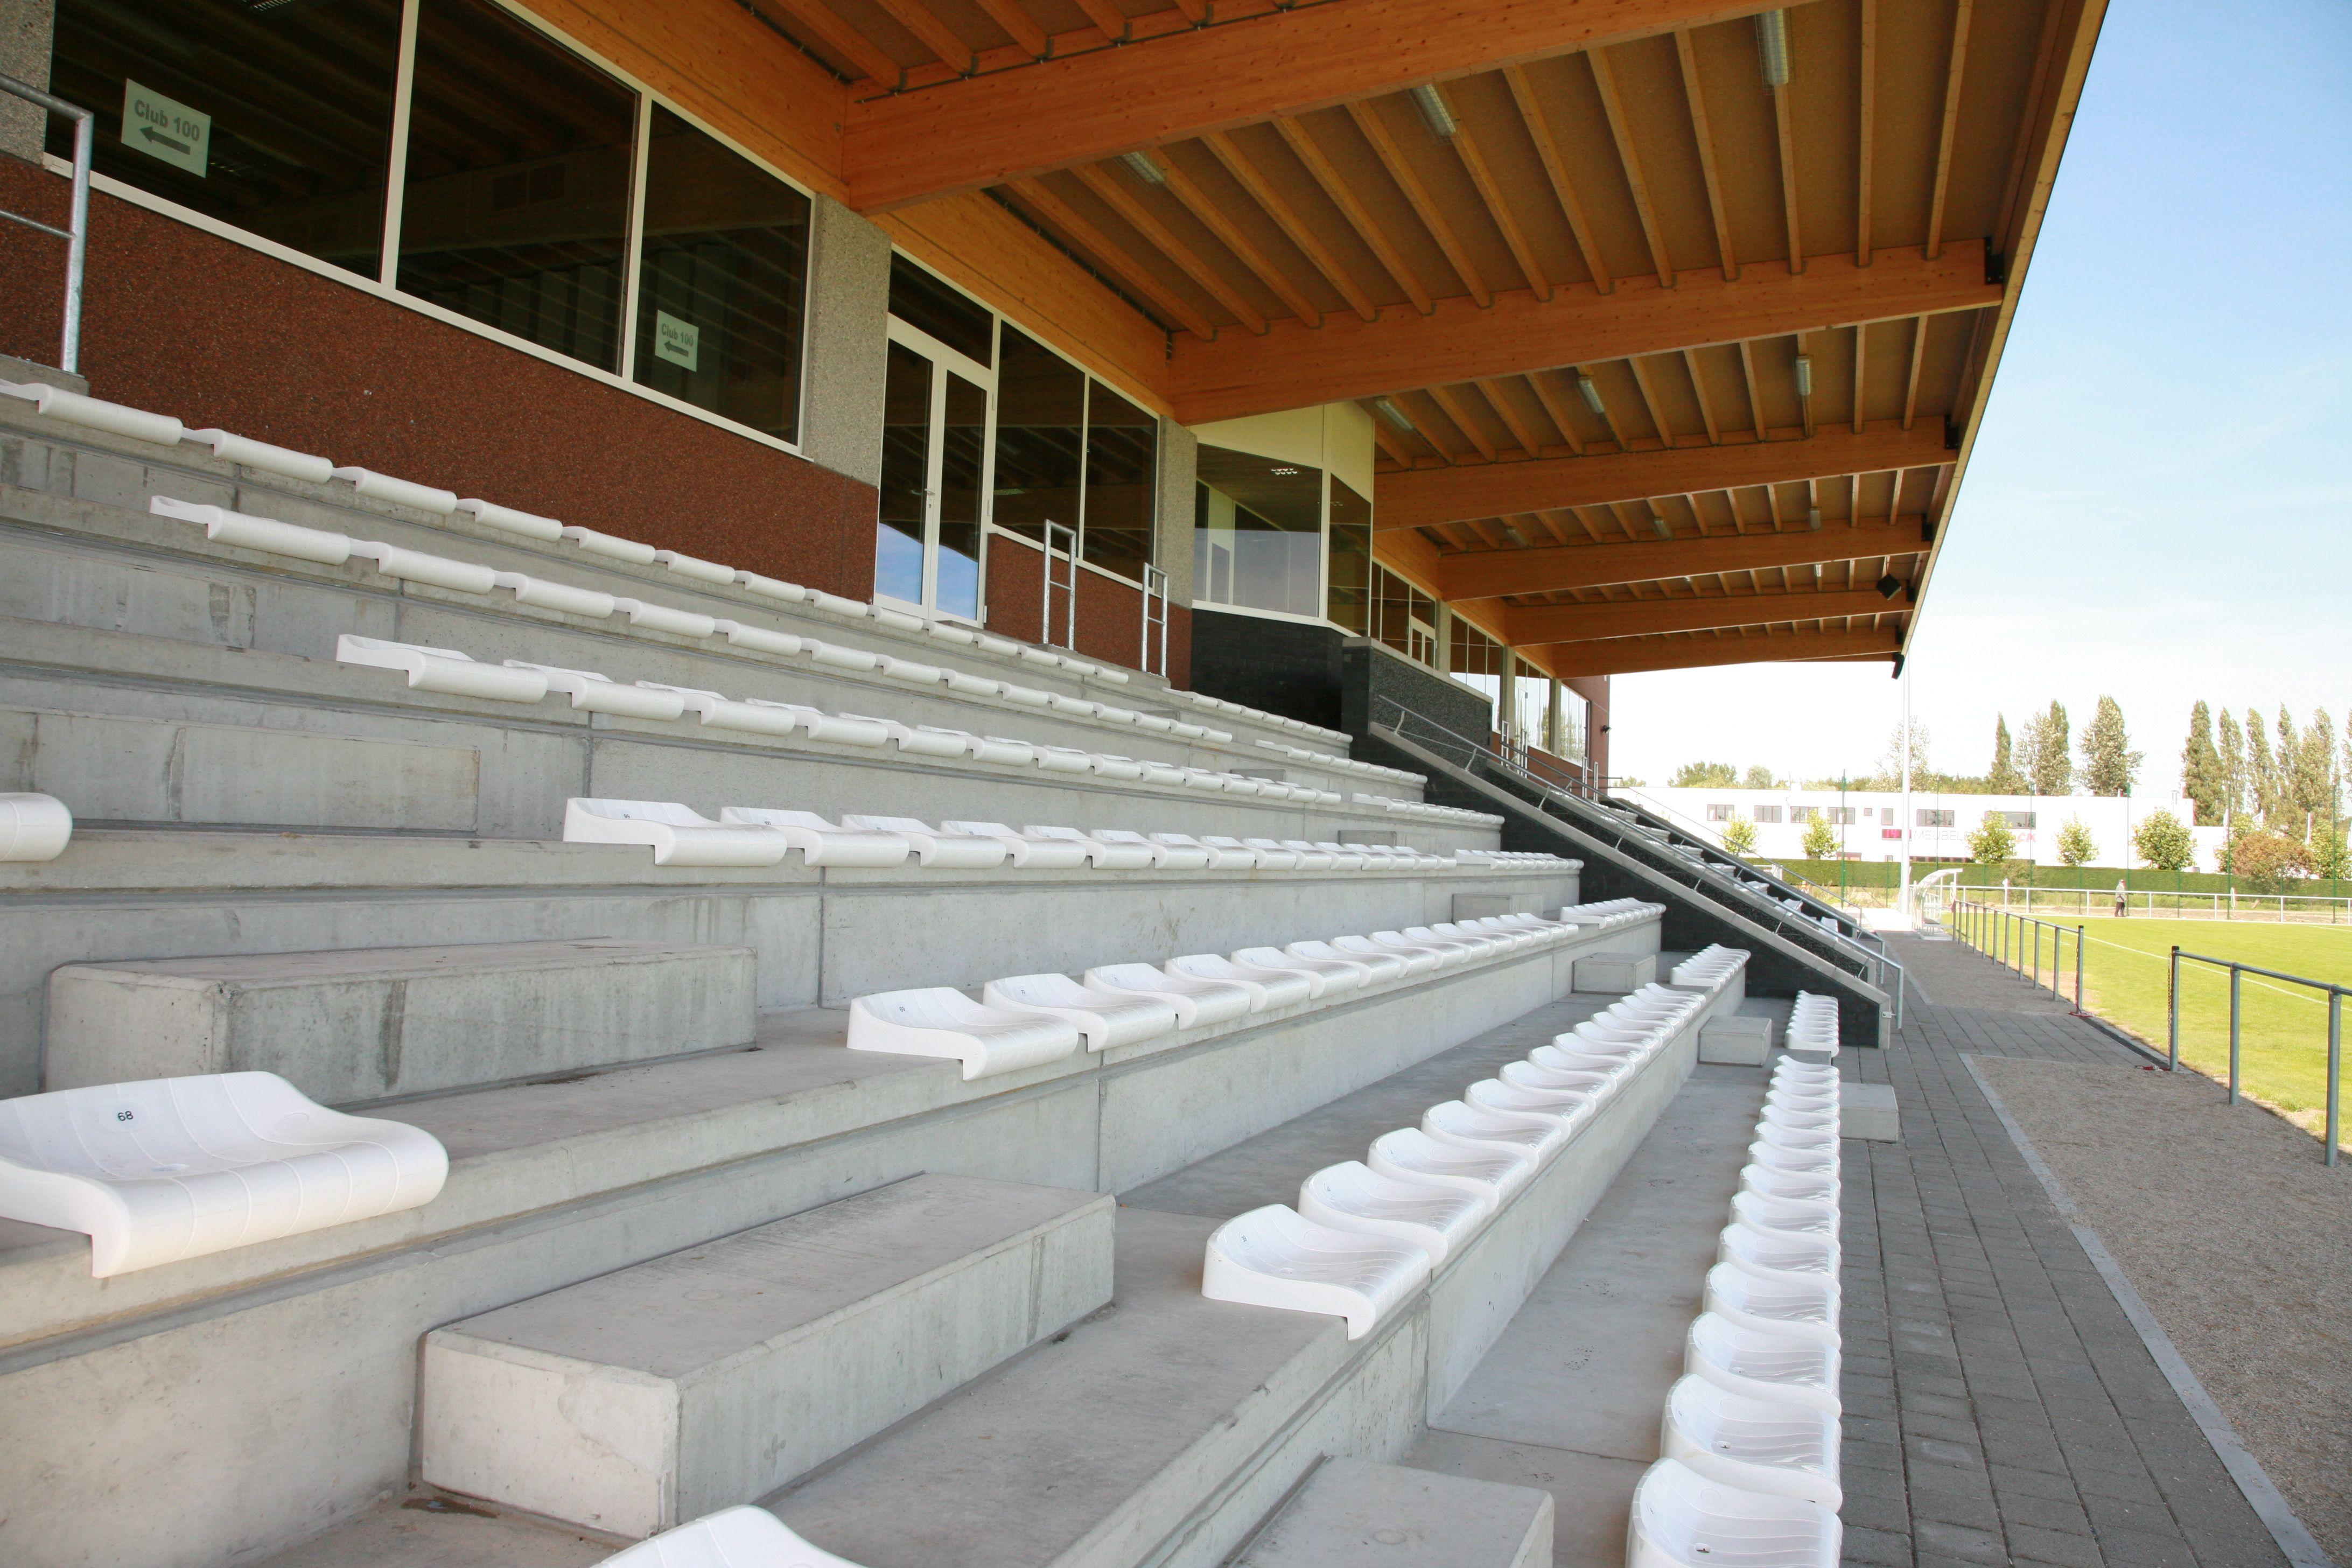 valcke prefab beton autres b timents industriels stade de football business park. Black Bedroom Furniture Sets. Home Design Ideas